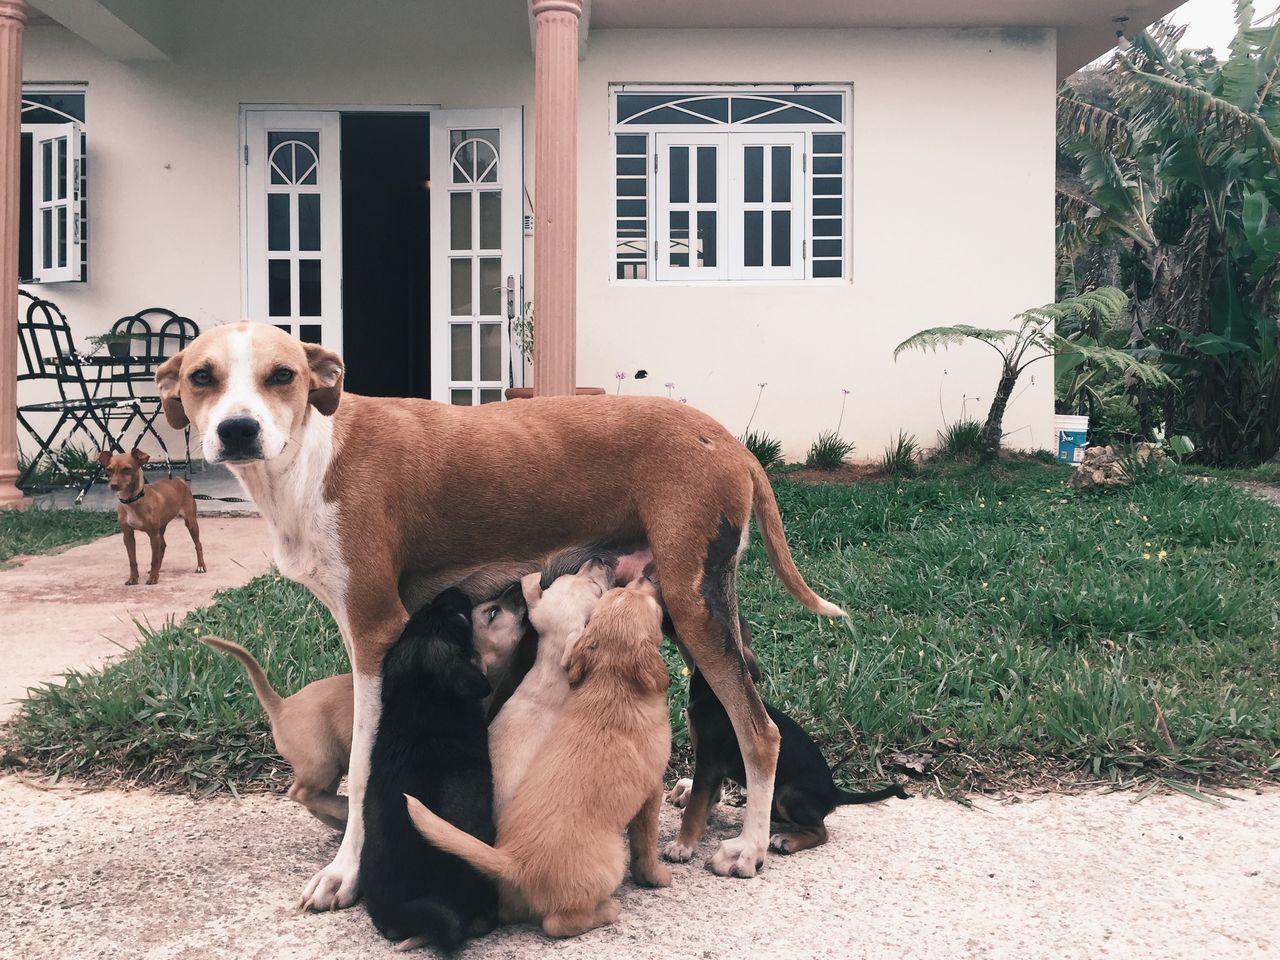 Dog feeding puppies outside house